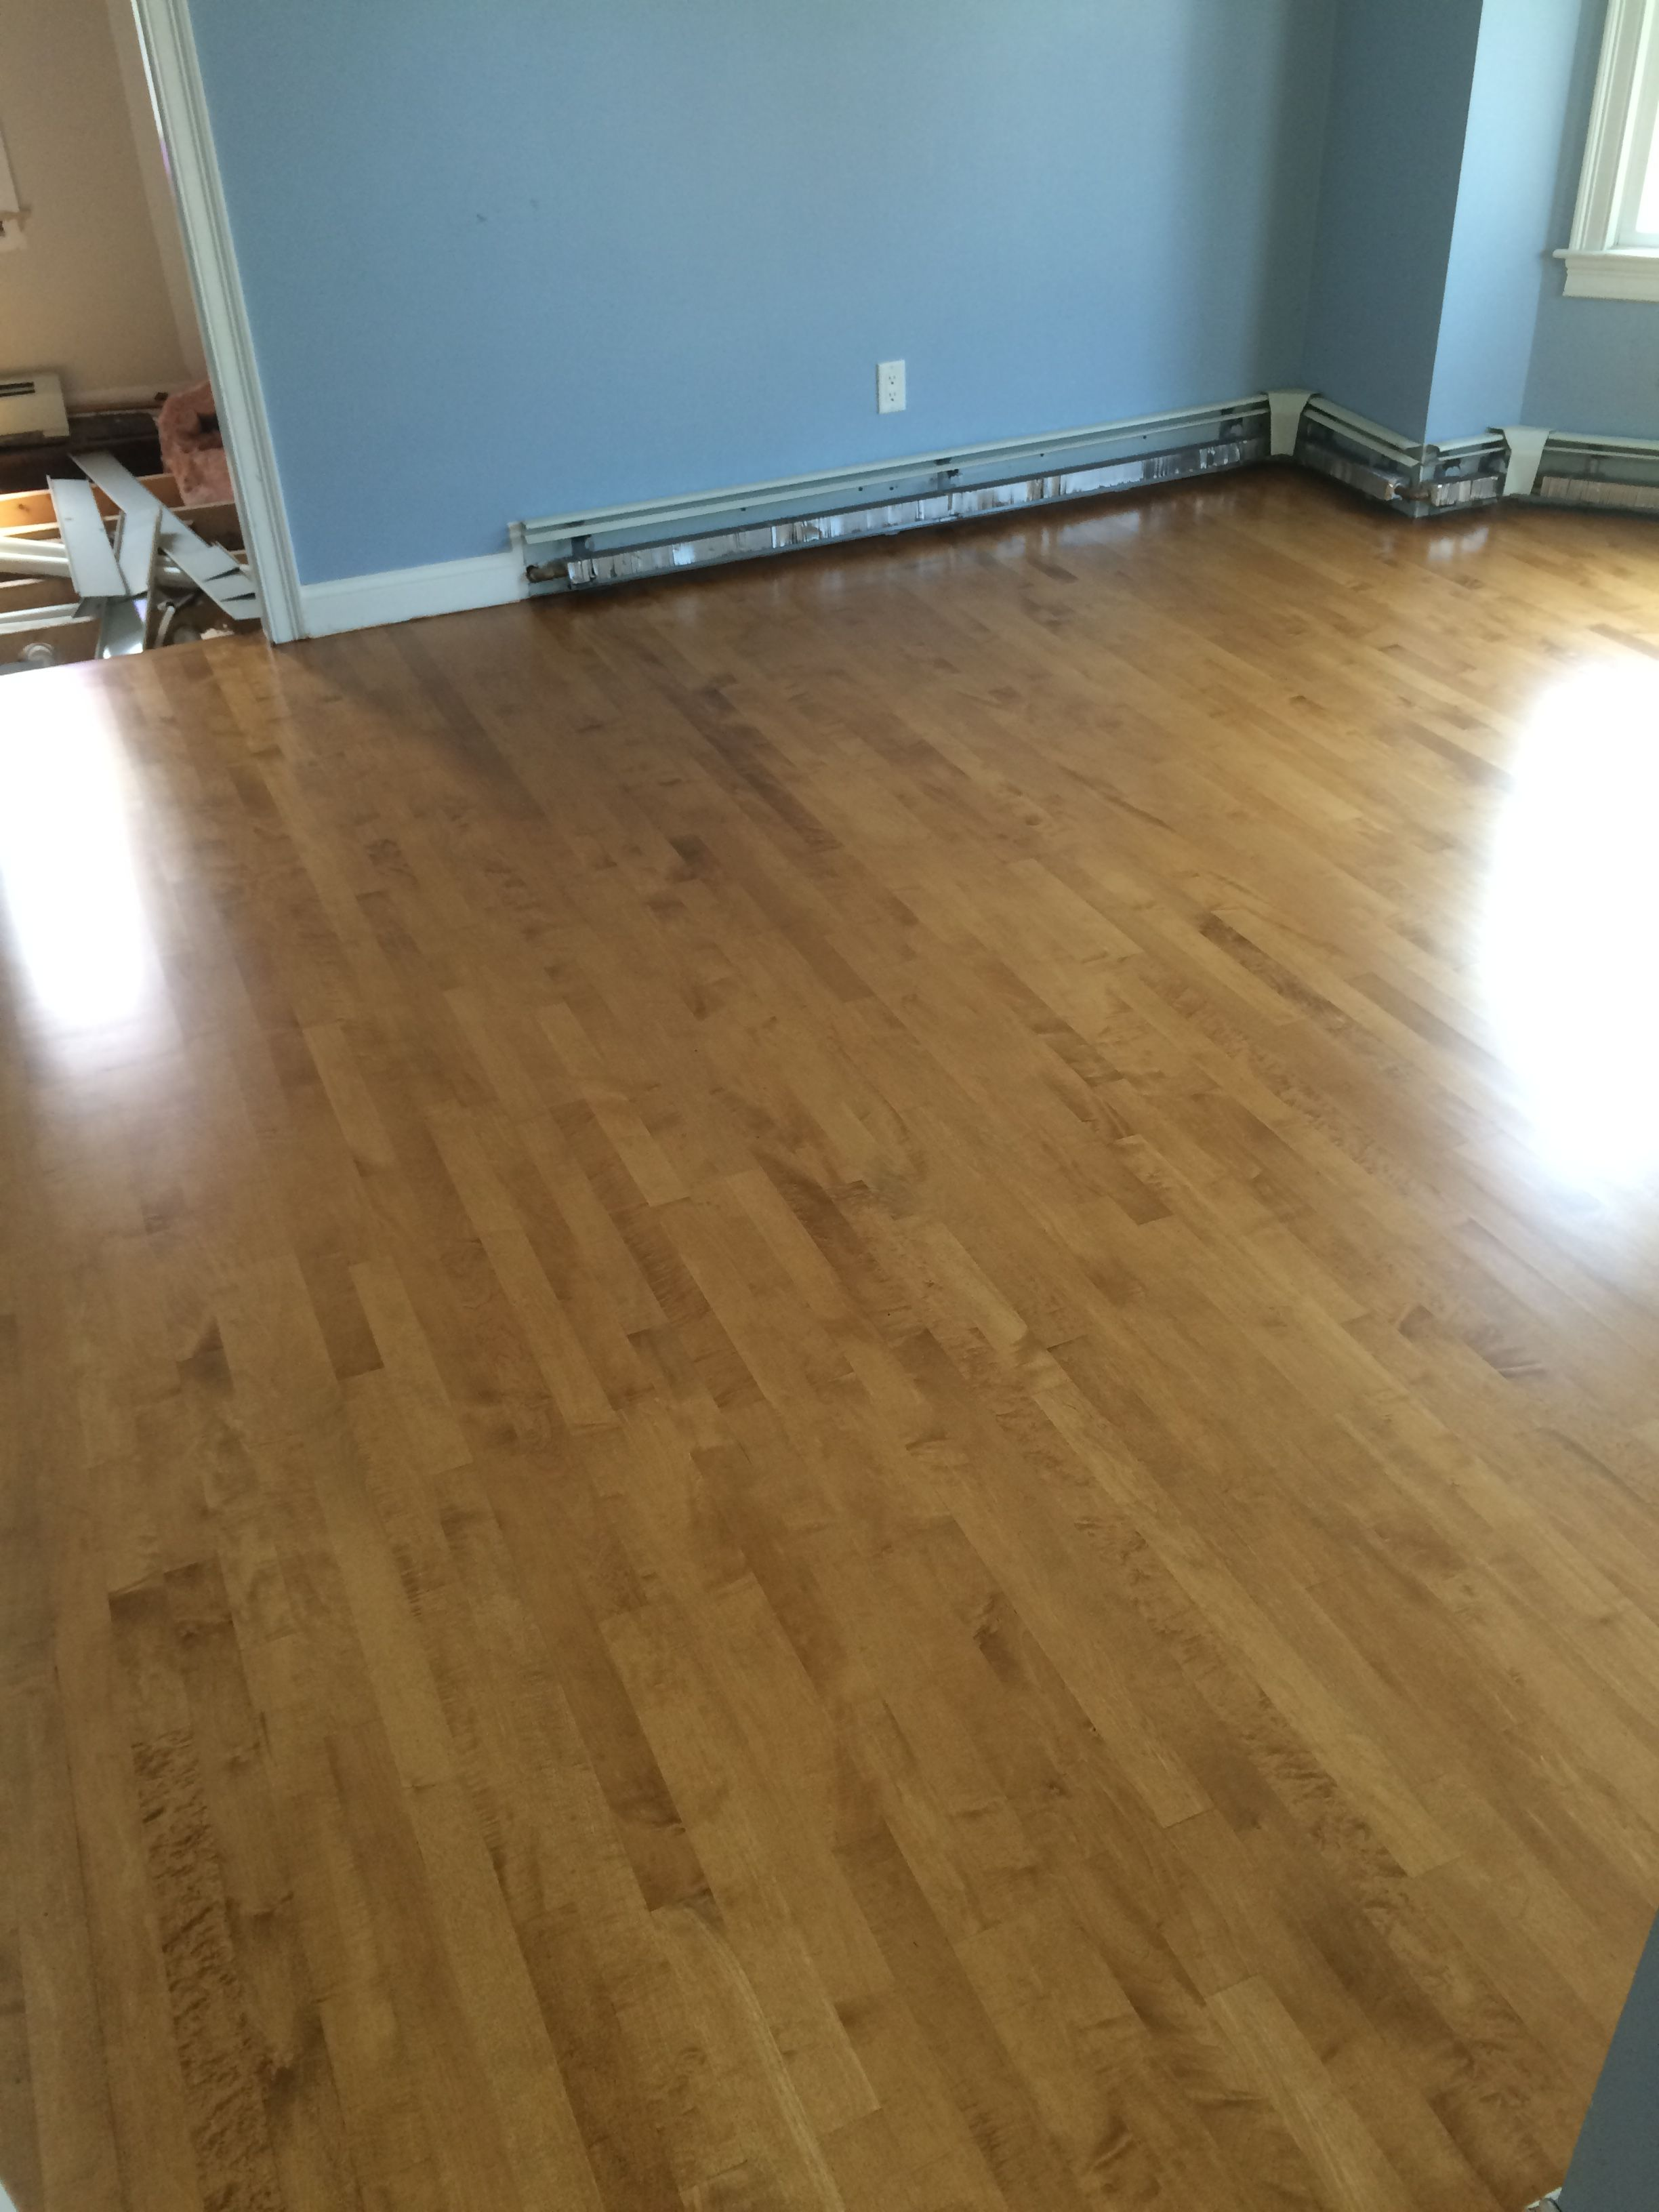 Zar S Walnut Floor Stain Staining Wood Wood Floors